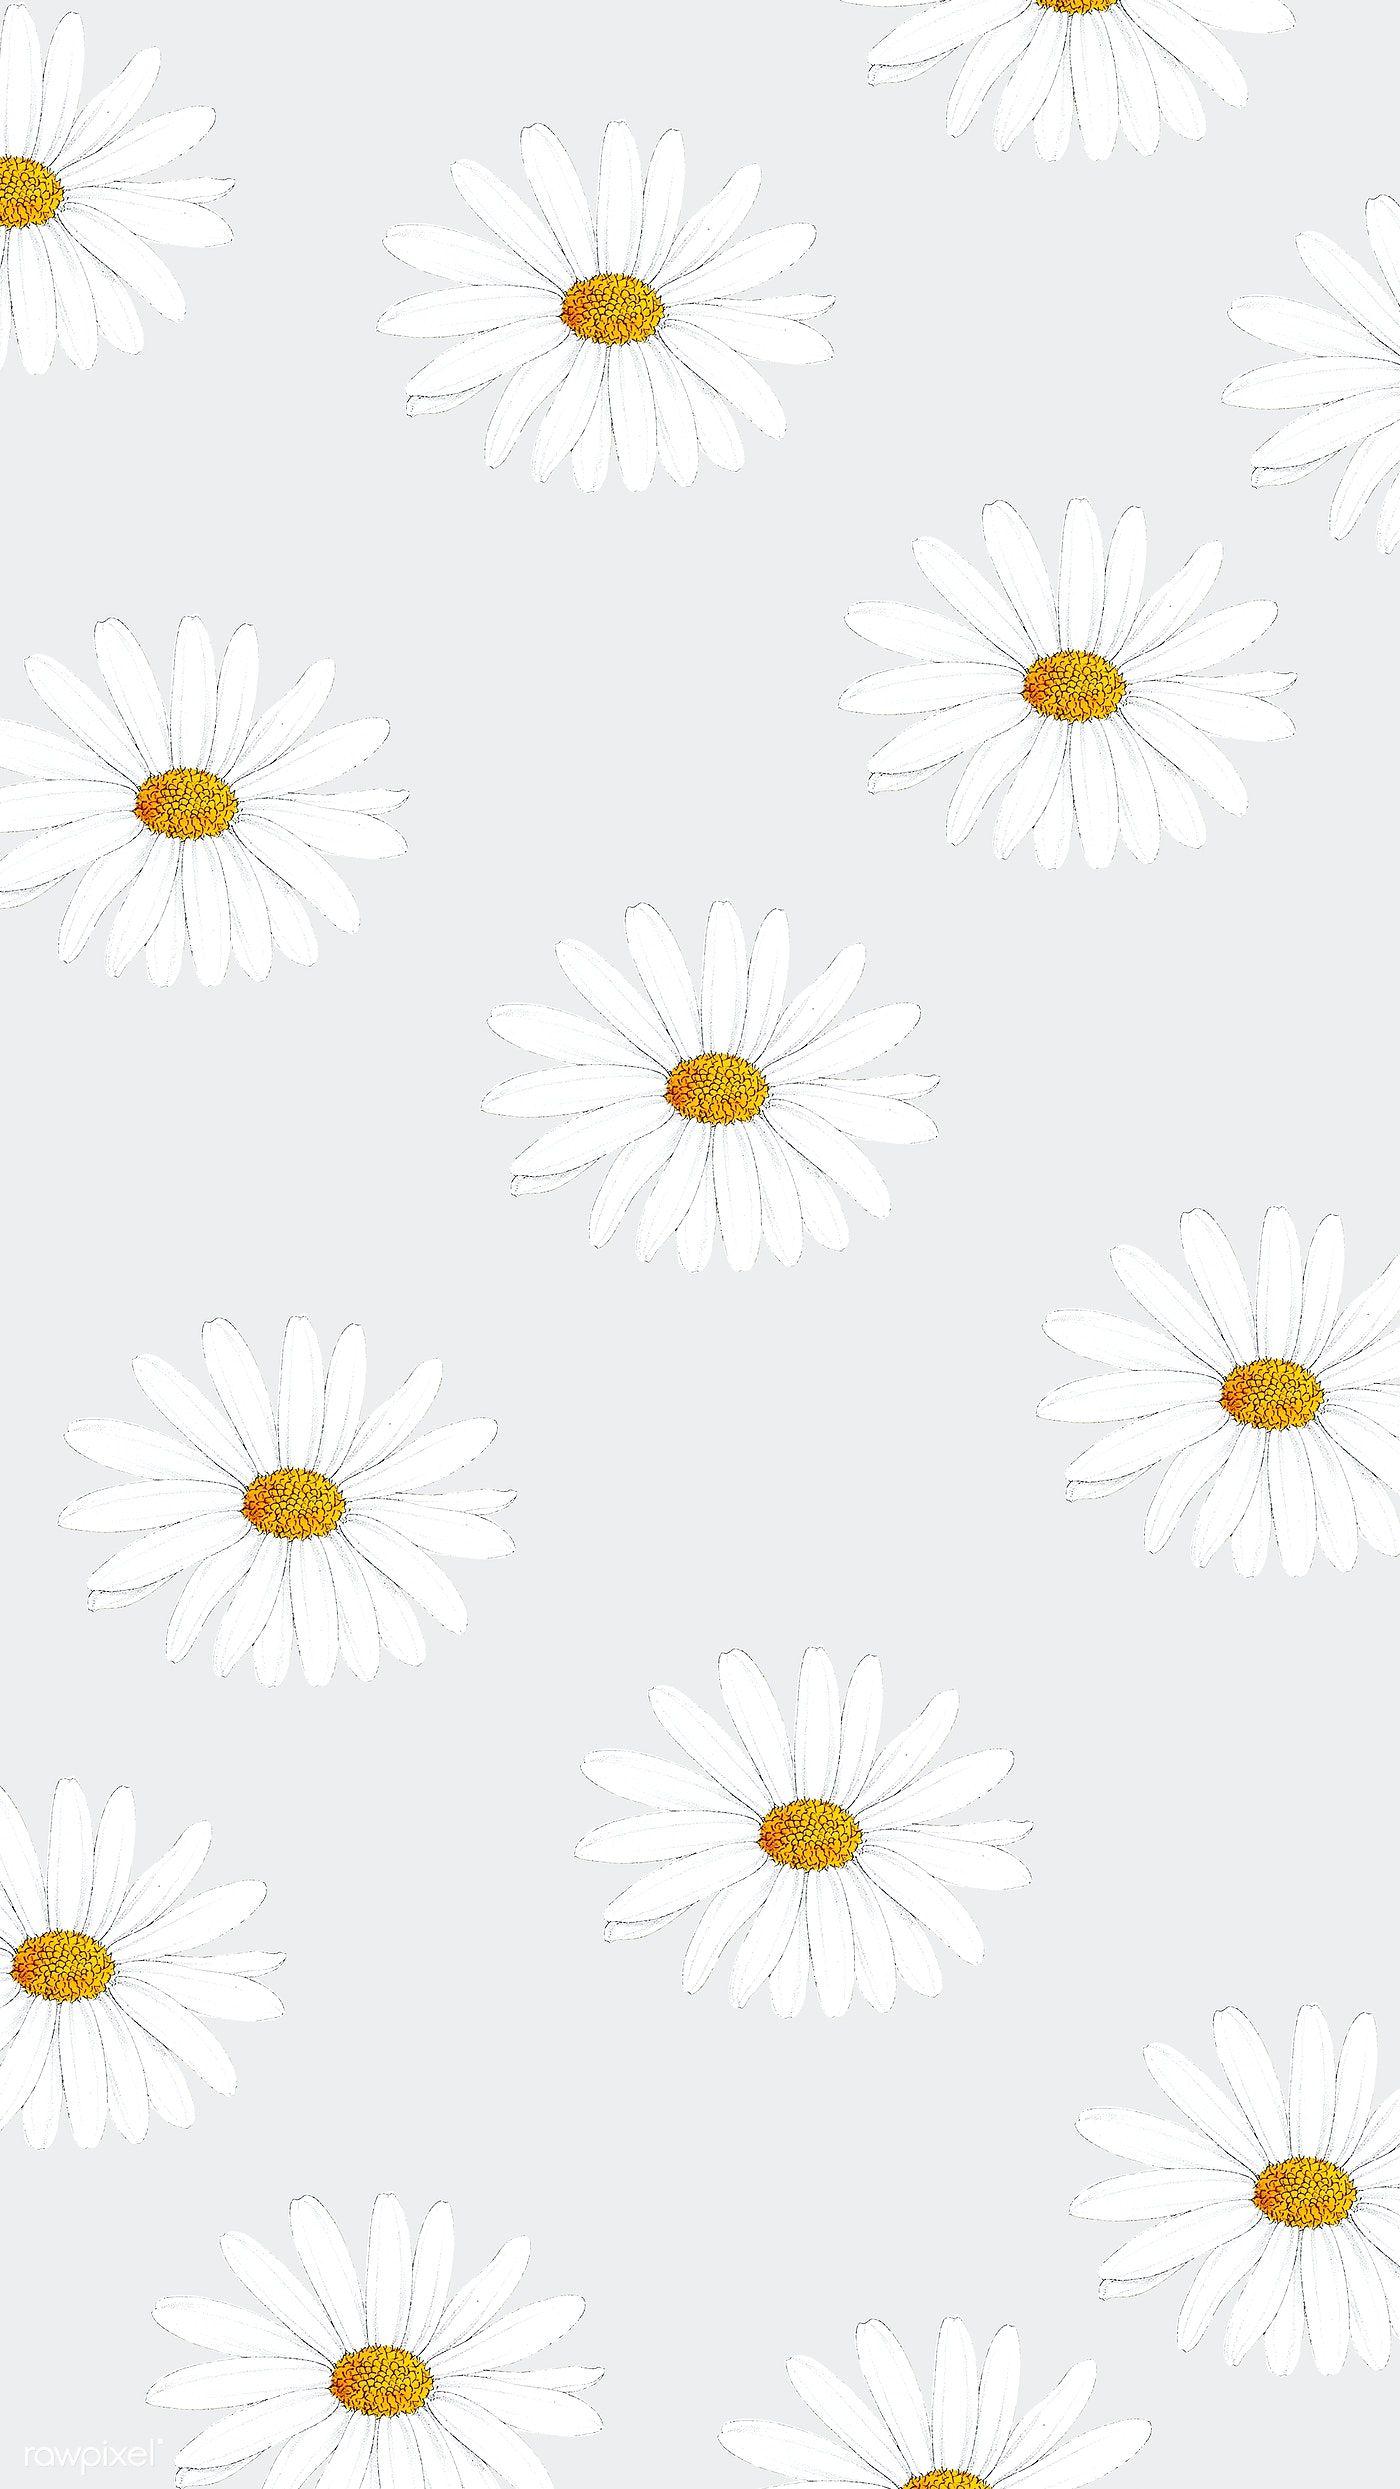 Download Premium Illustration Of Hand Drawn White Flower Patterned Mobile Daisy Wallpaper White Flowers Cute Patterns Wallpaper